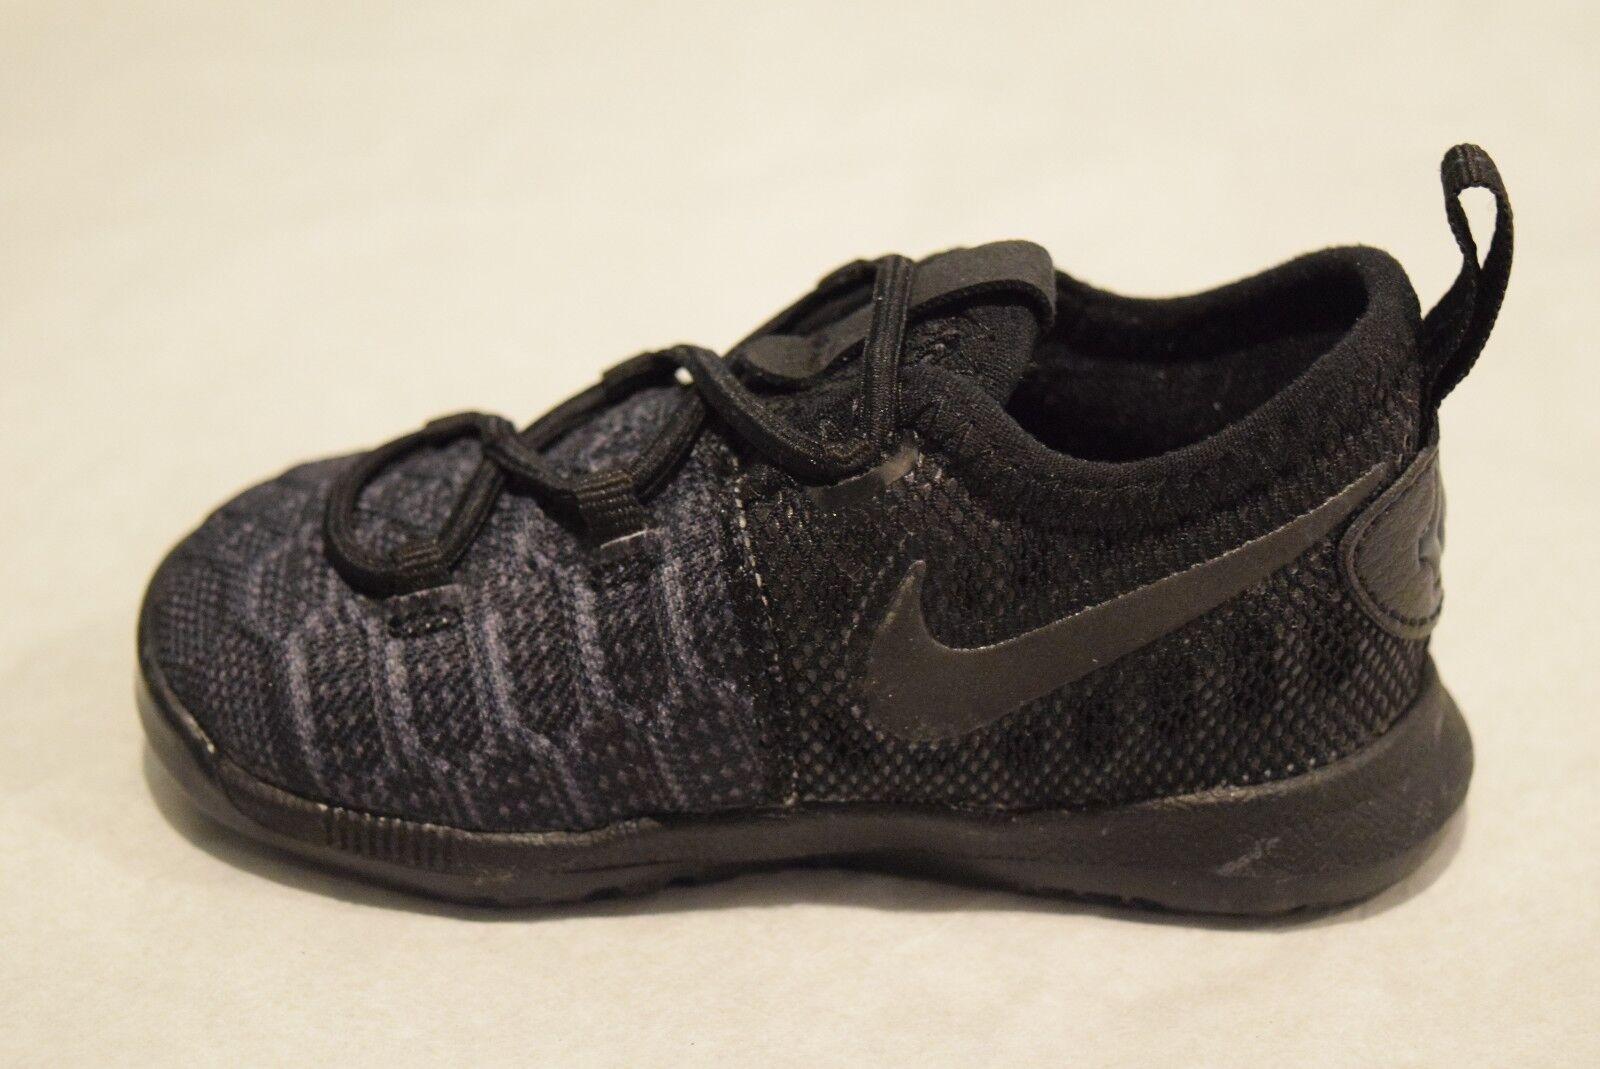 81c646e9cc6e Nike KD 9 Boys  Toddler Black black anthracite 55910001 5 for sale online